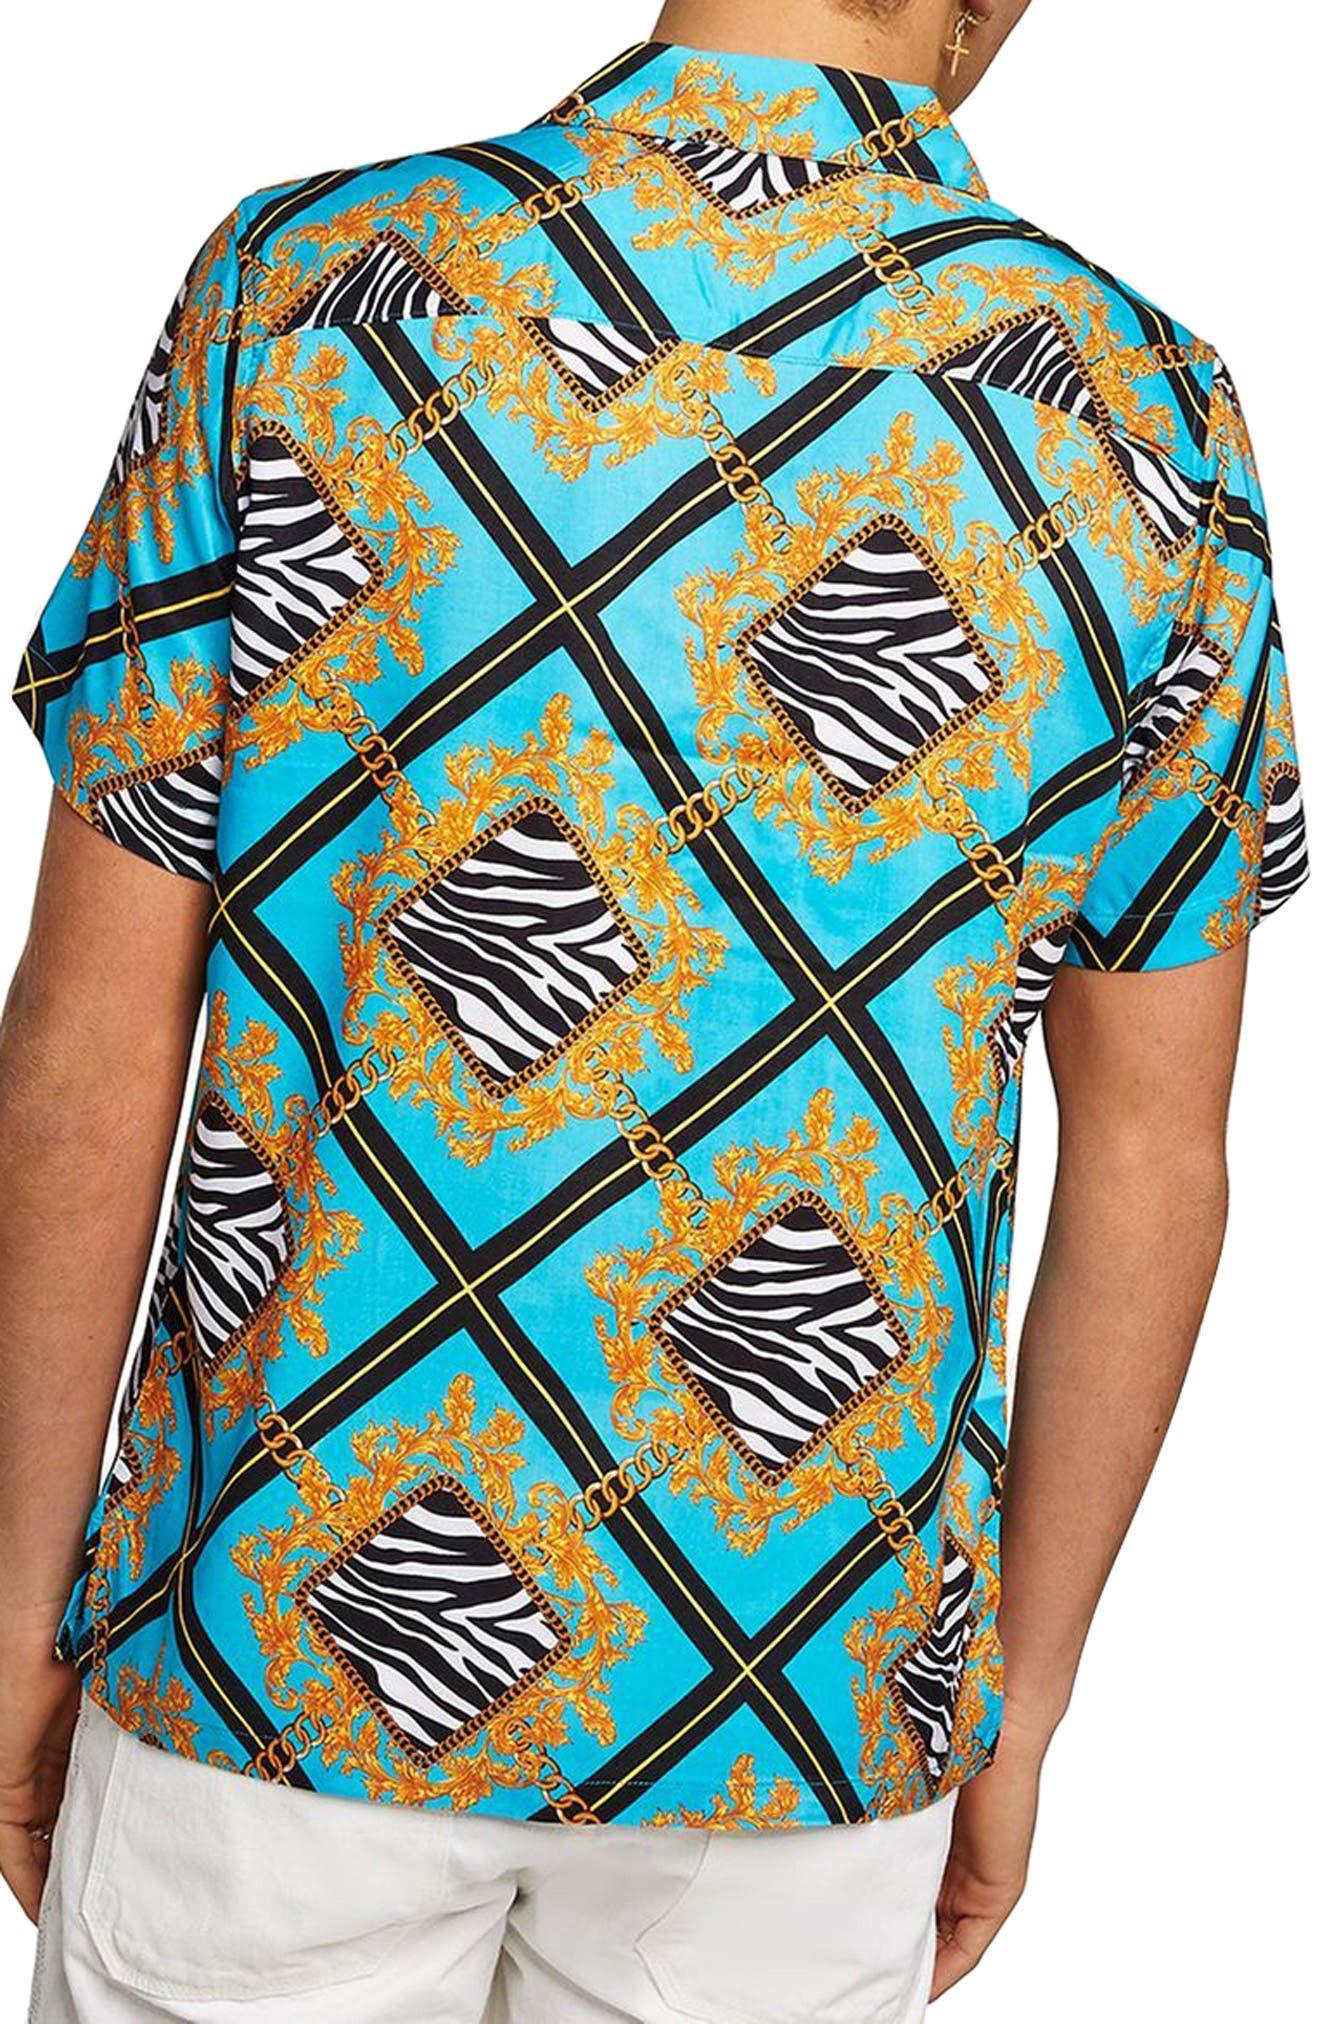 Baroque Zebra Print Shirt,                             Alternate thumbnail 2, color,                             400